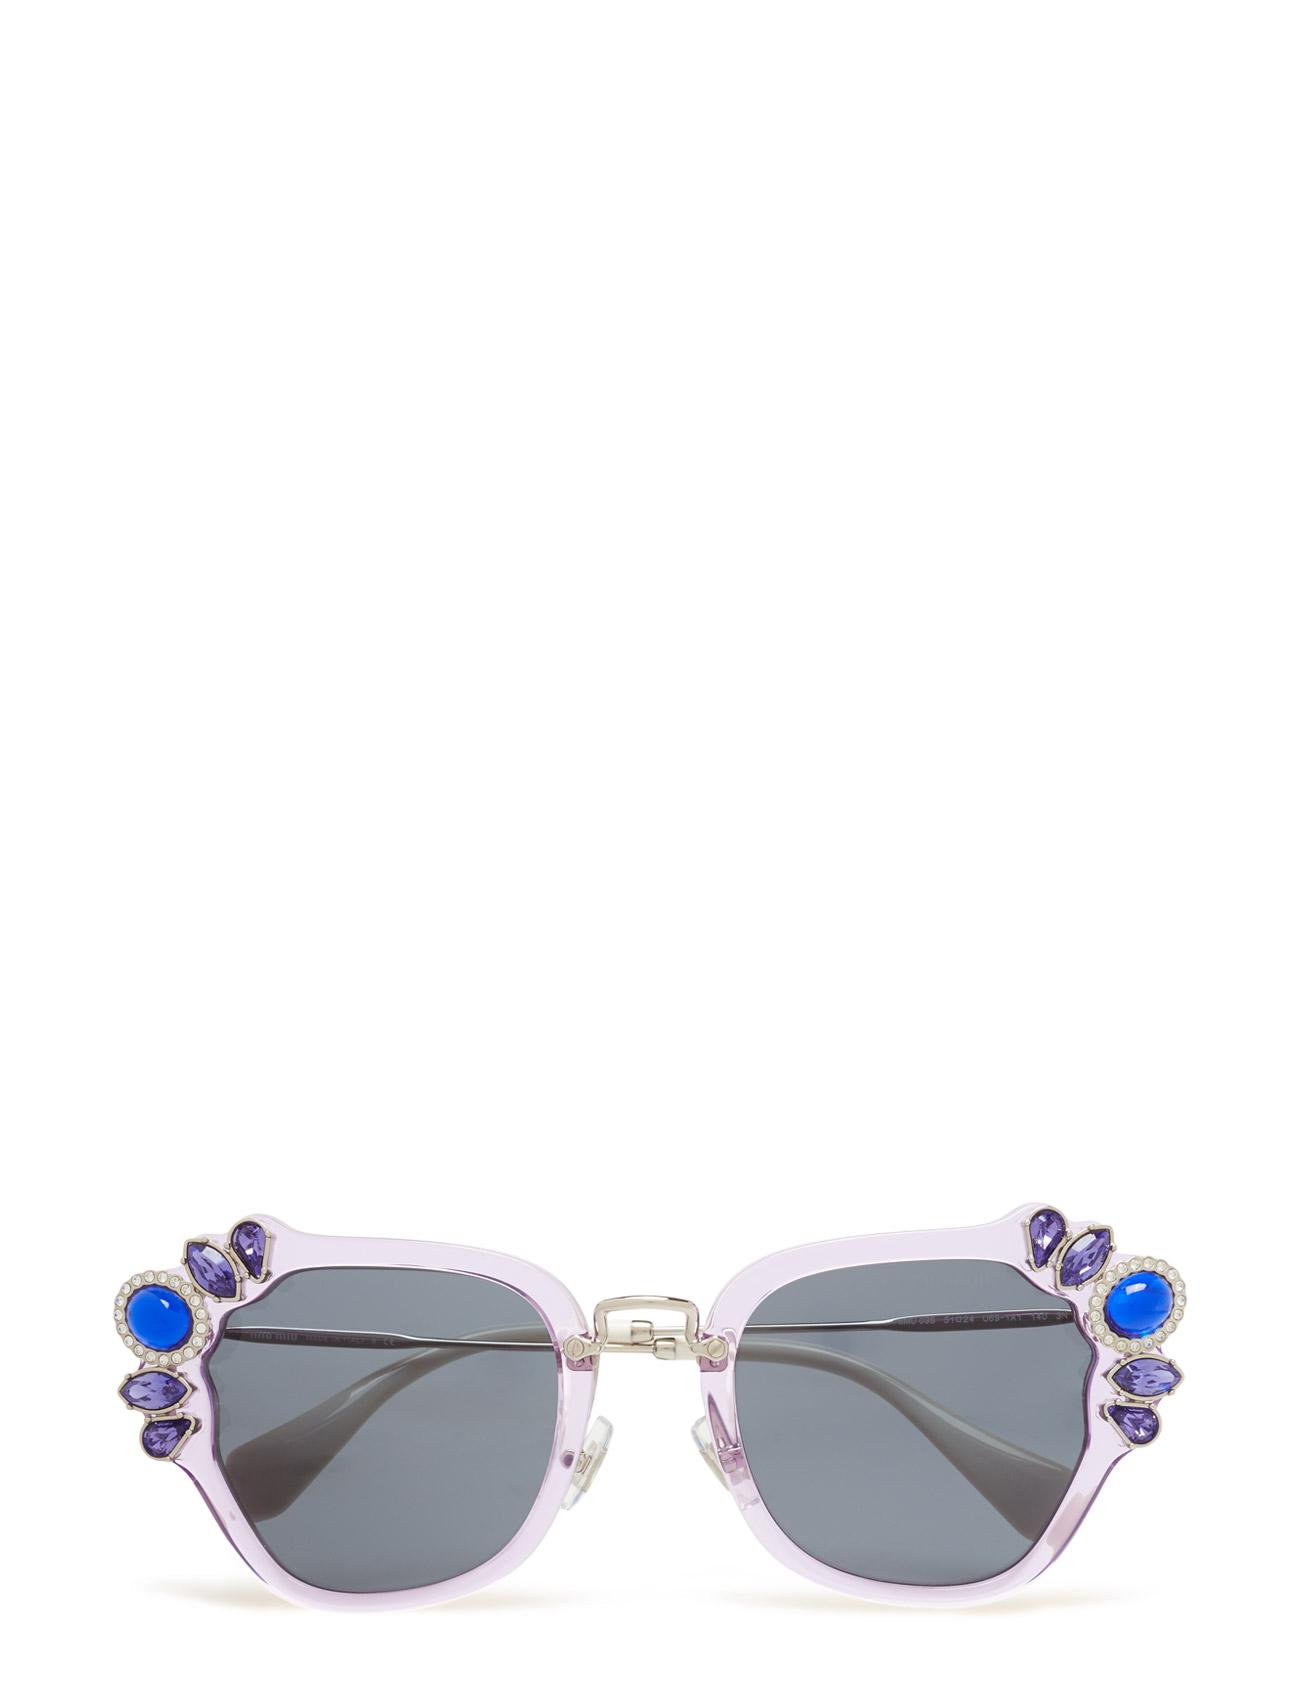 Cat Eye Miu Miu Sunglasses Solbriller til Damer i Lilac